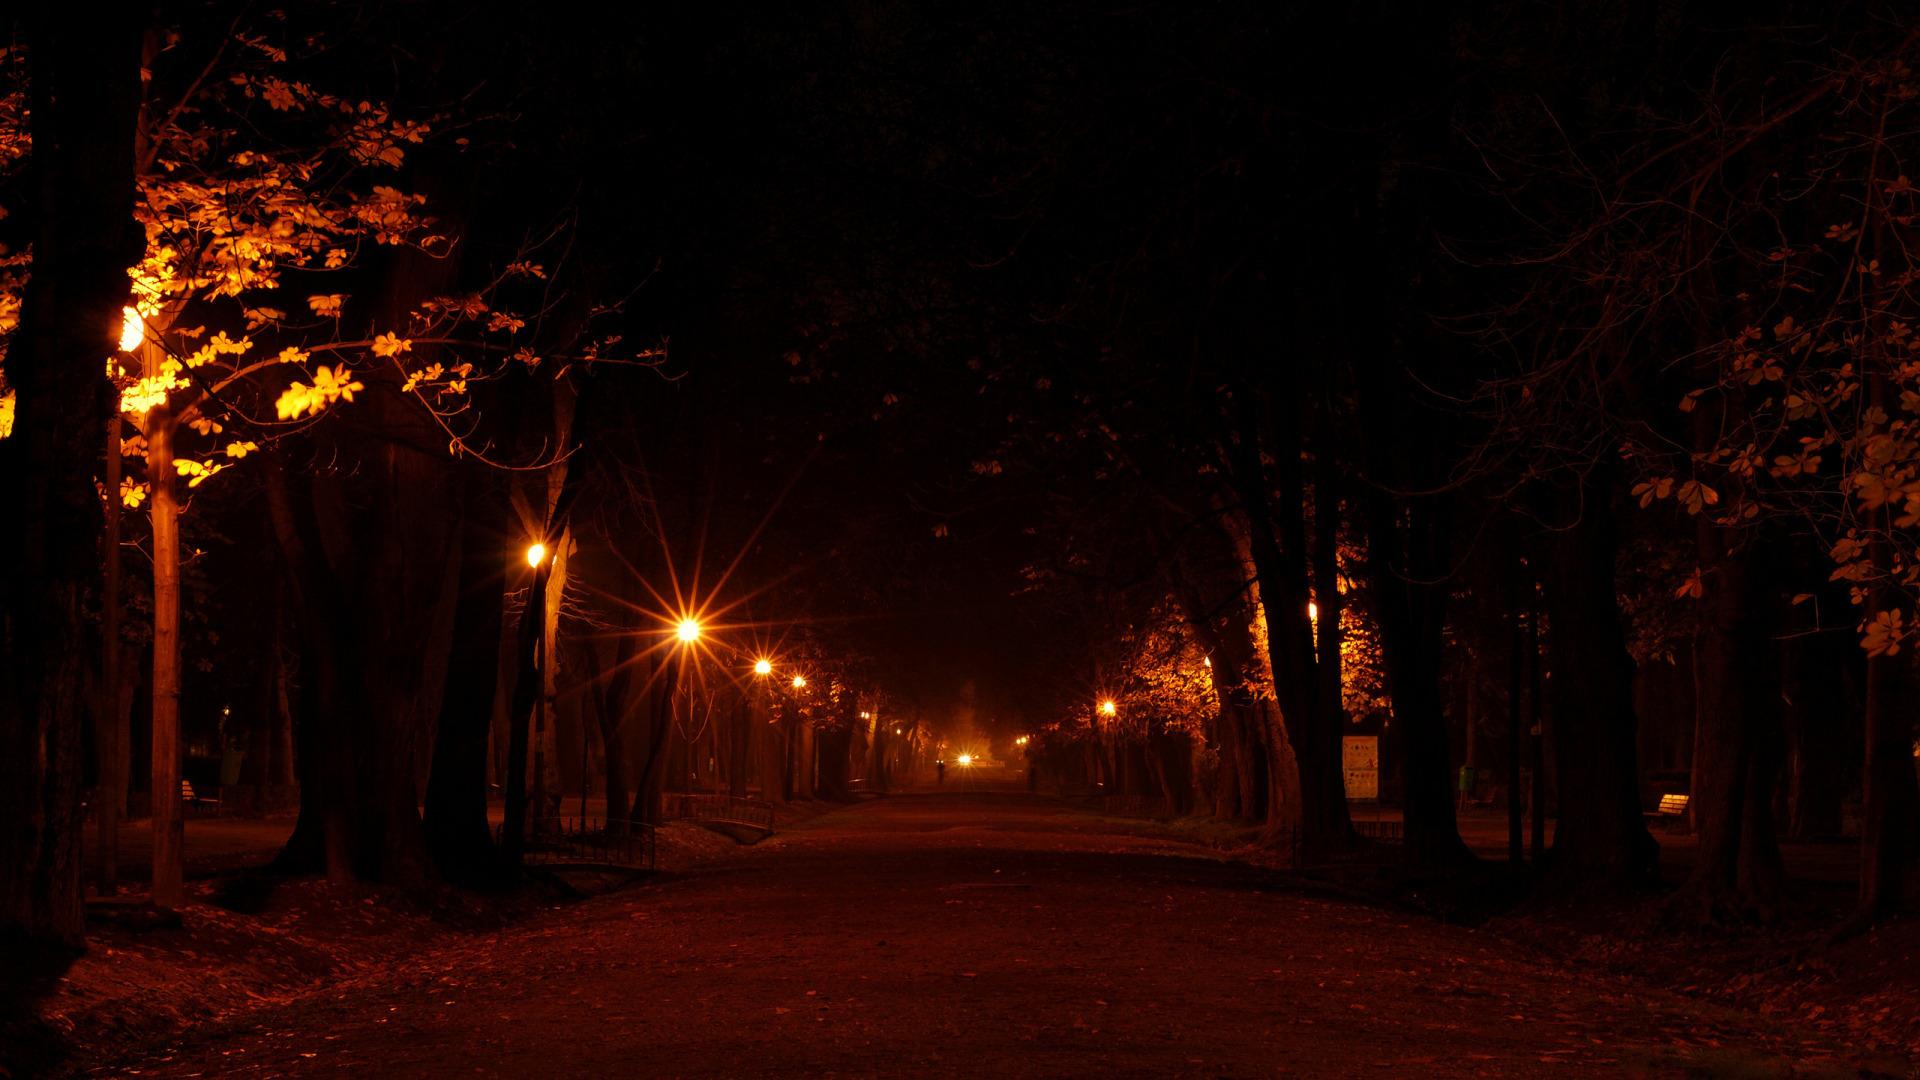 Франция дороги ночь фонари  № 2229305 бесплатно